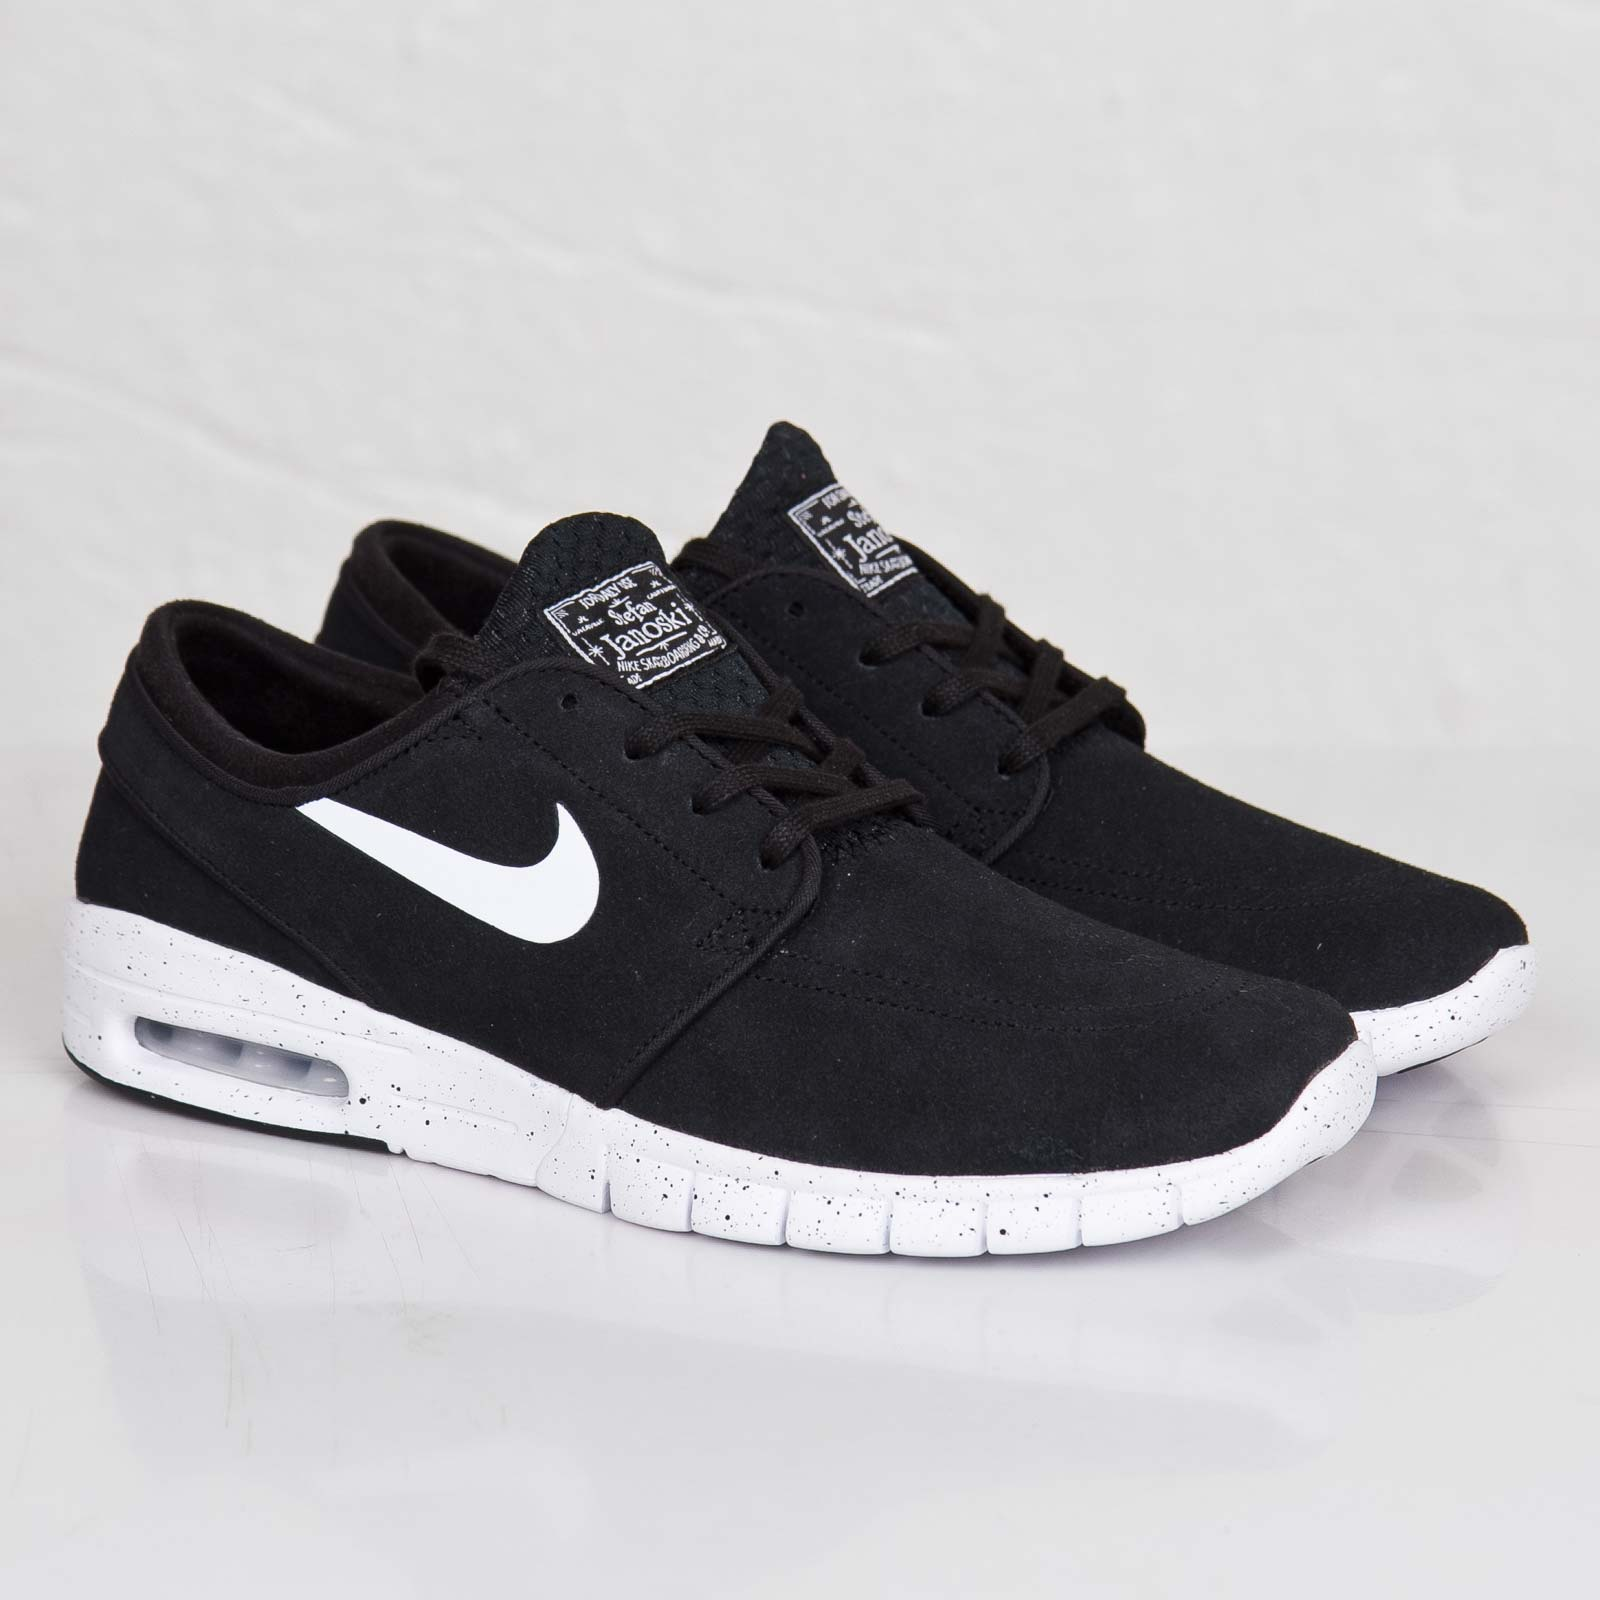 cheap for discount cdbbc 930ab Nike Stefan Janoski Max Leather